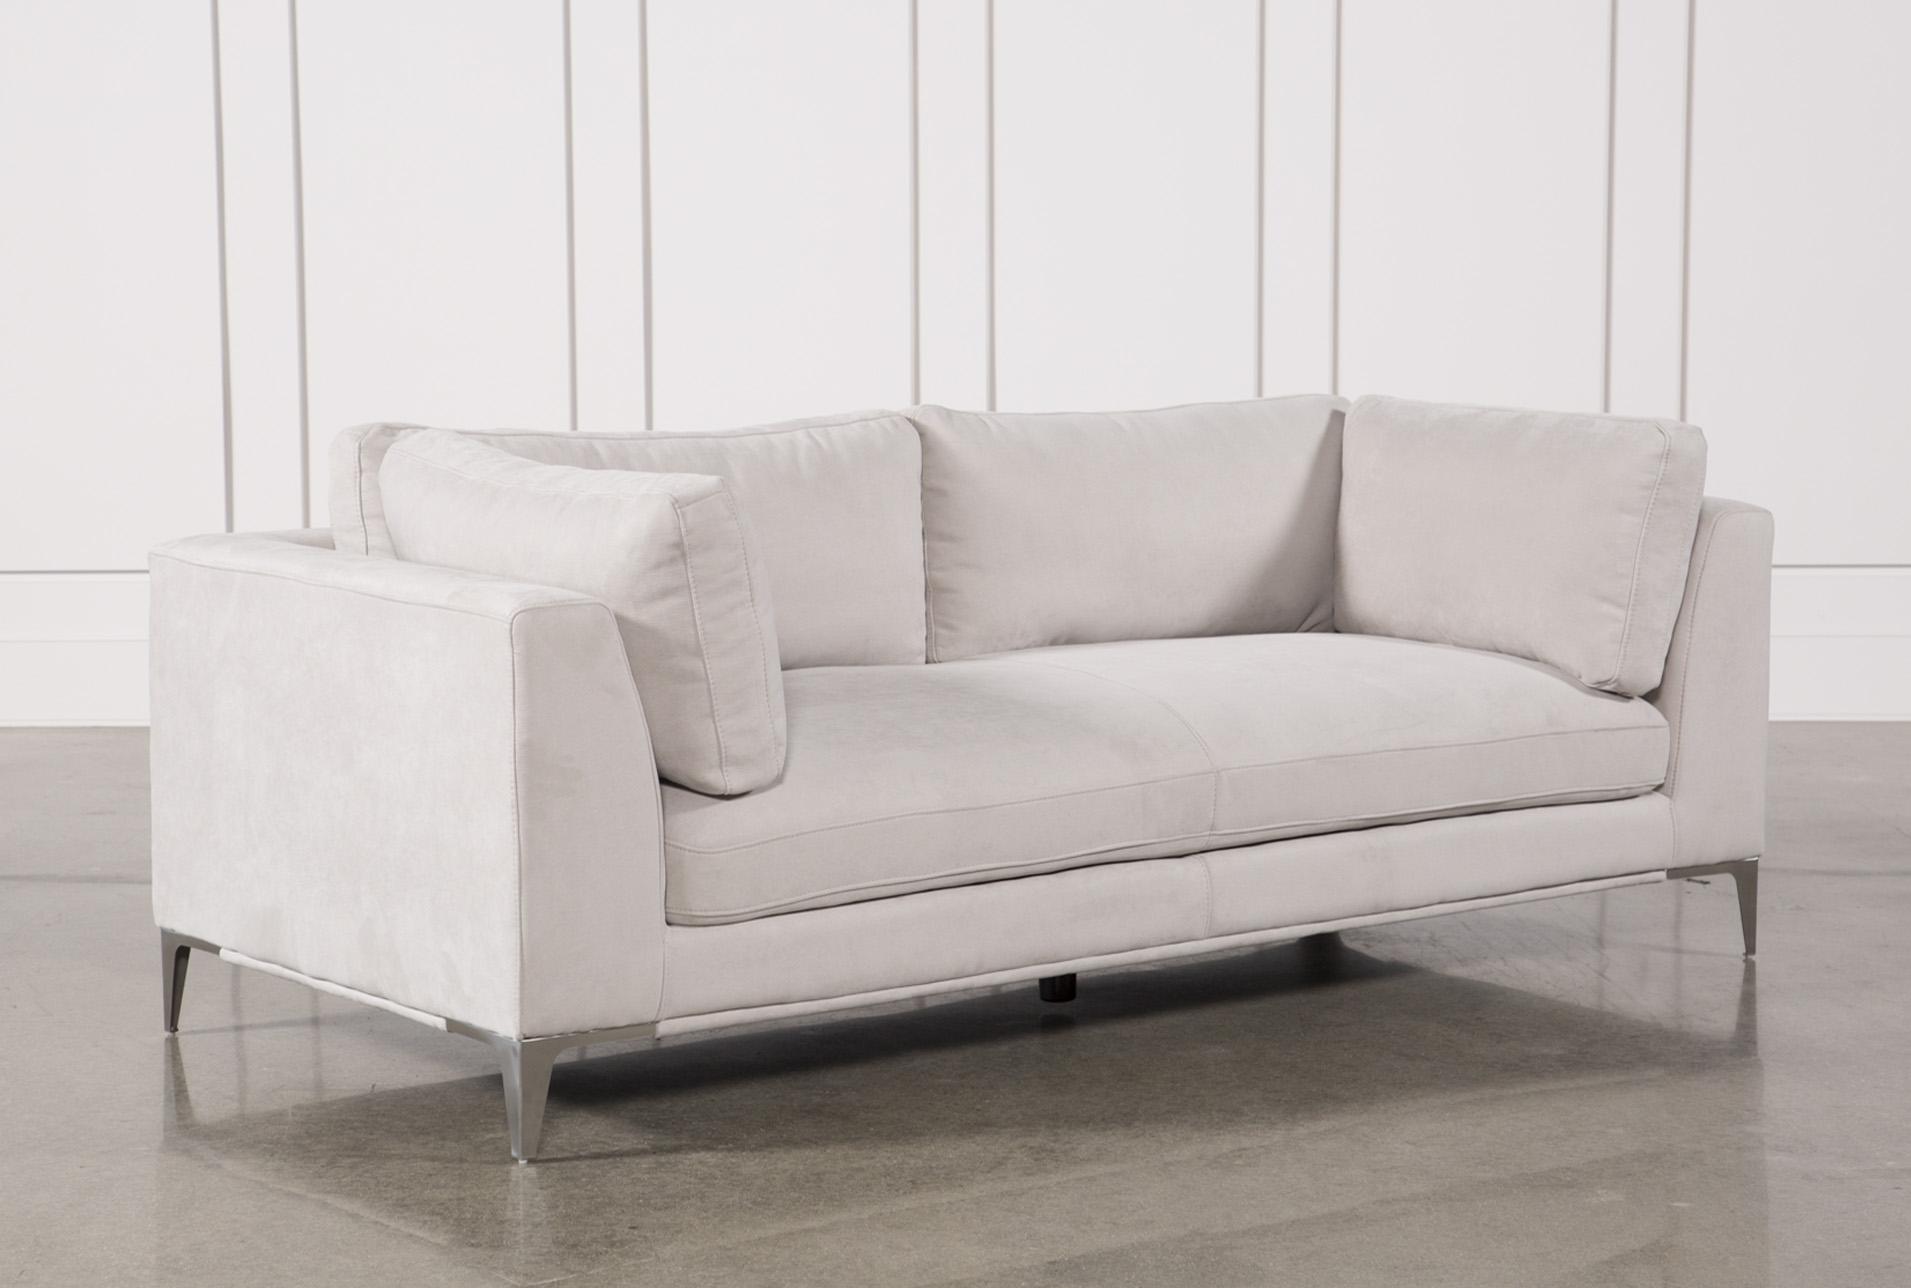 Apollo Light Grey Sofa W/2 Pillows